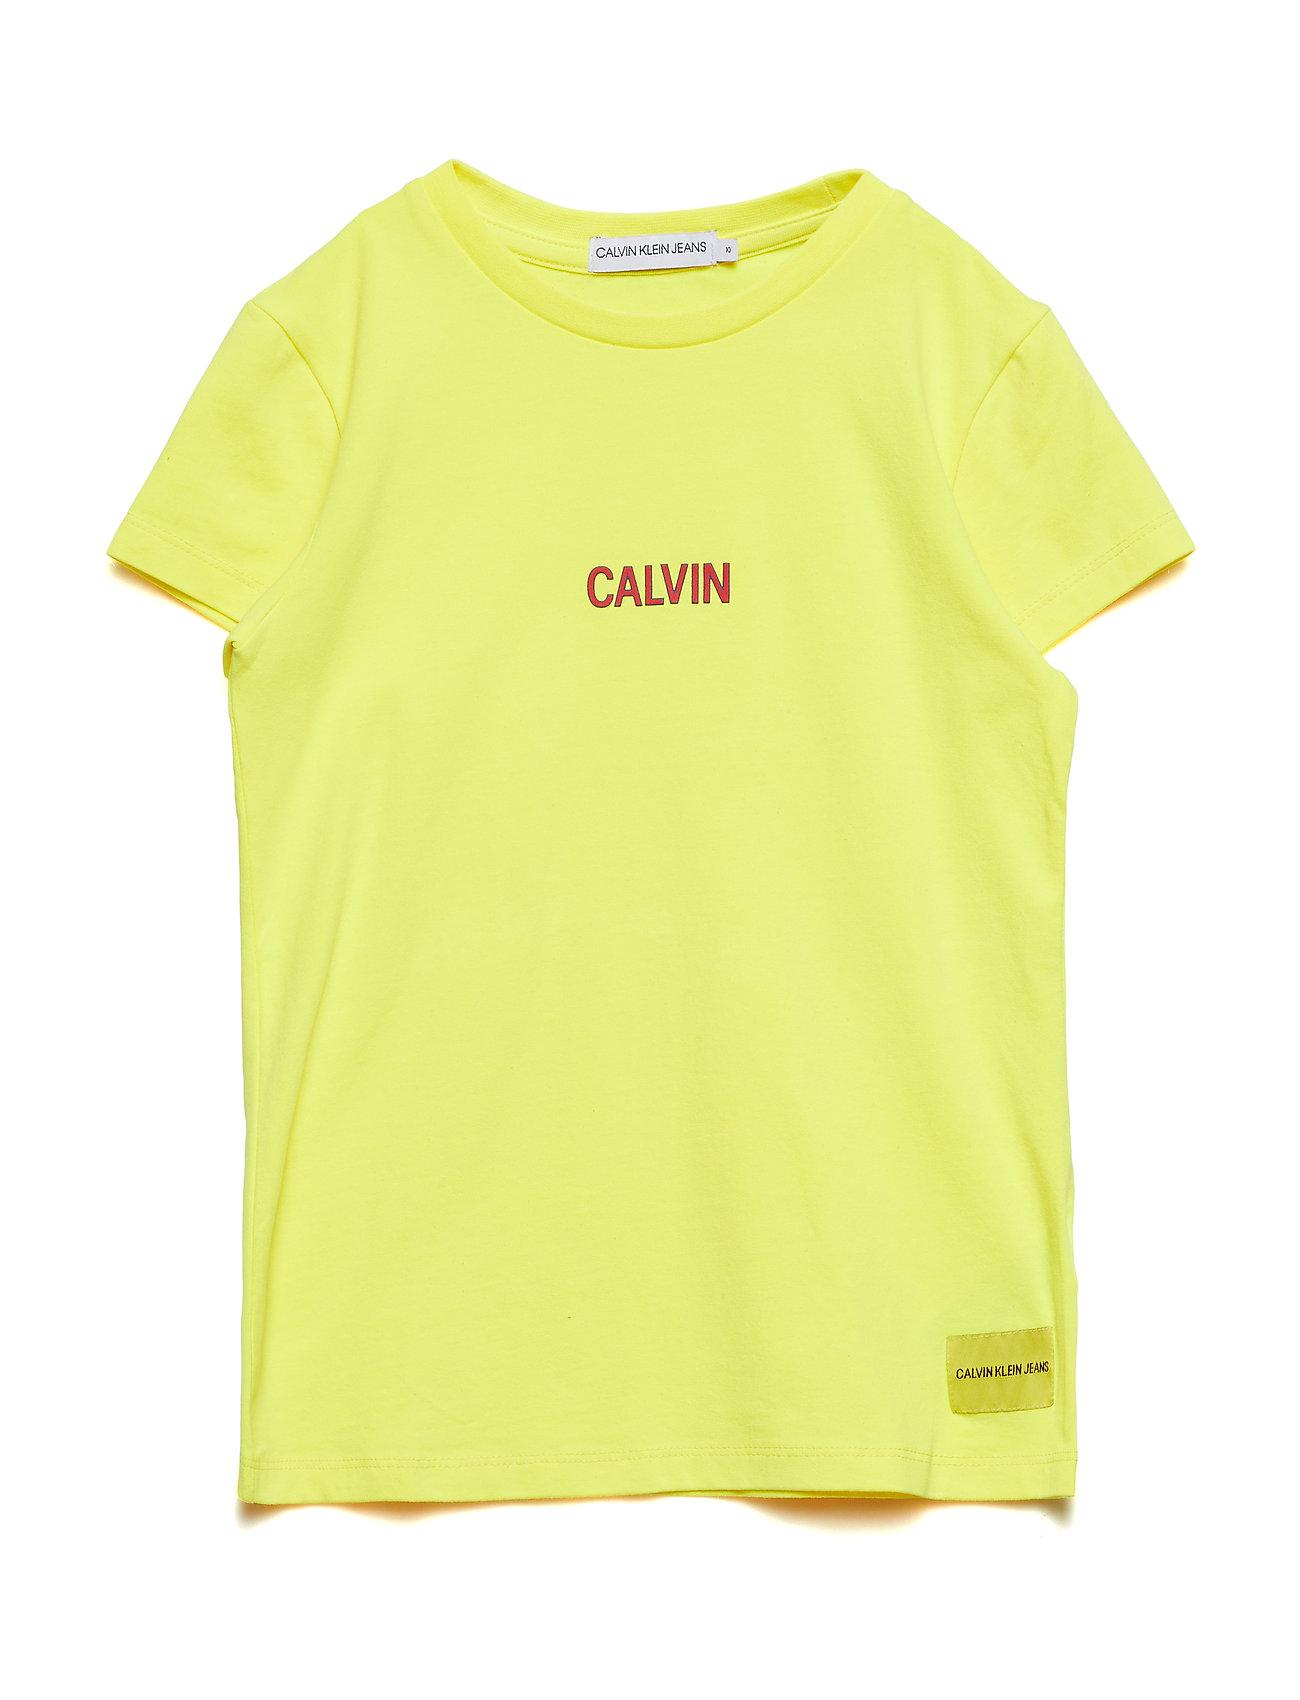 Calvin Klein SMALL CALVIN LOGO SLIM FIT TEE - LEMON TONIC